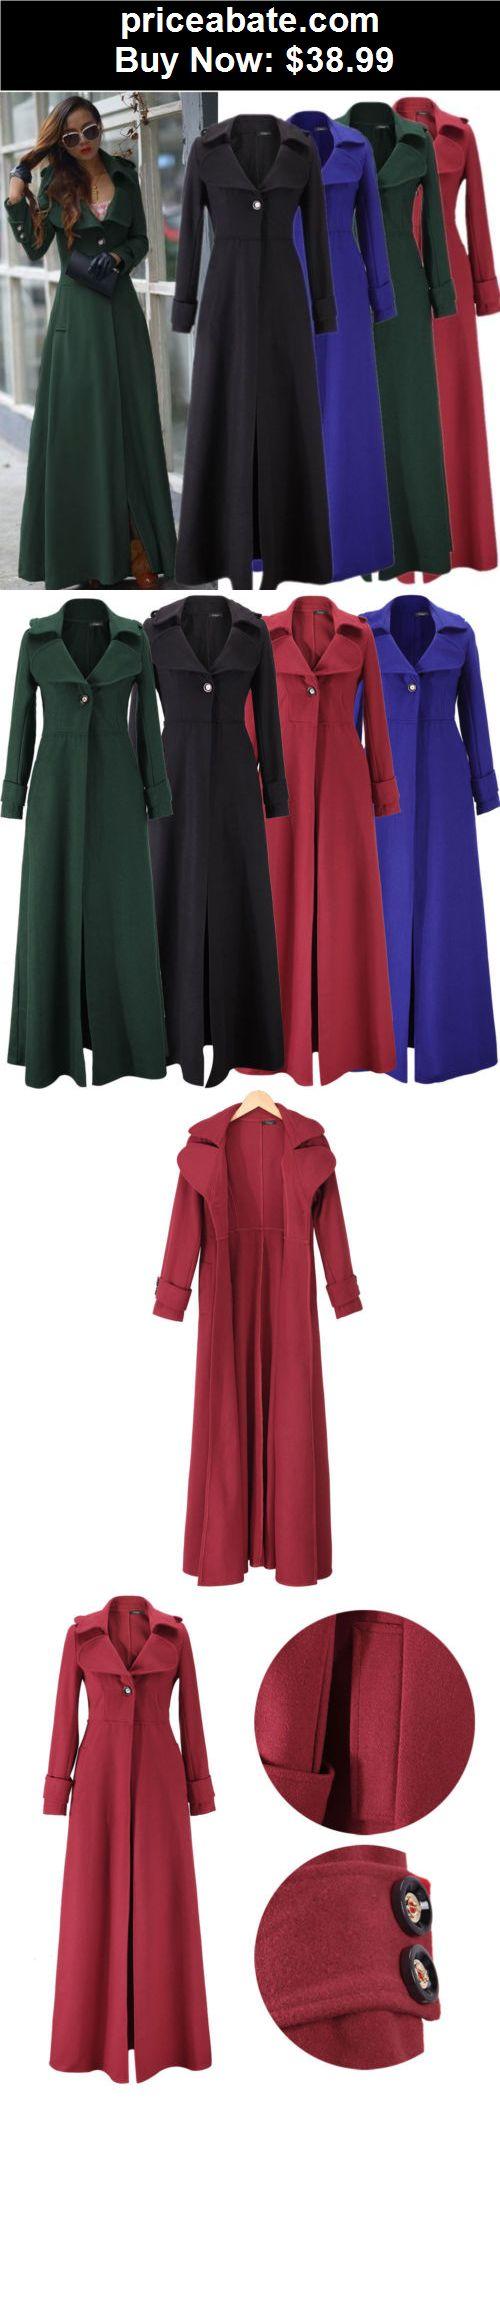 Women-Coats-And-Jackets: Women Full-Length Winderbreaker Wool Blend Jacket  Slim Fit Long Trench Coat - BUY IT NOW ONLY $38.99